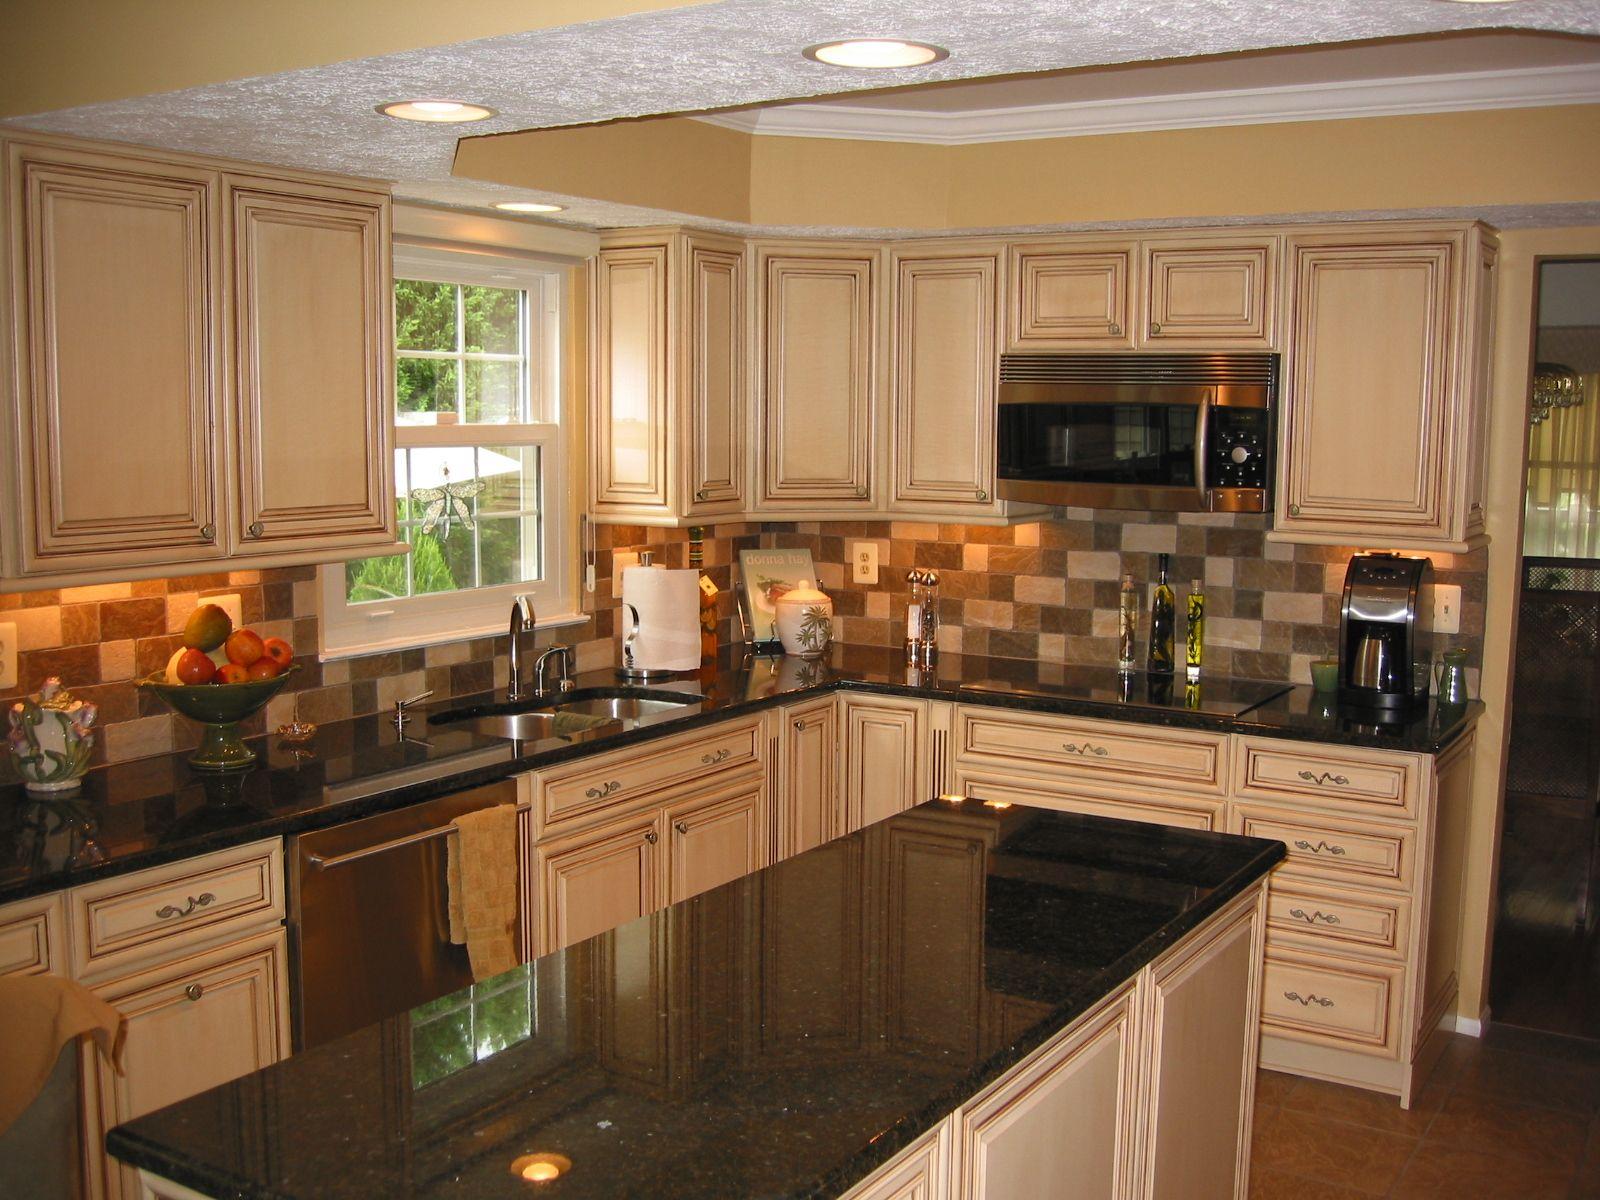 glazed kitchen cabinets, granite countertops, porcelain tile